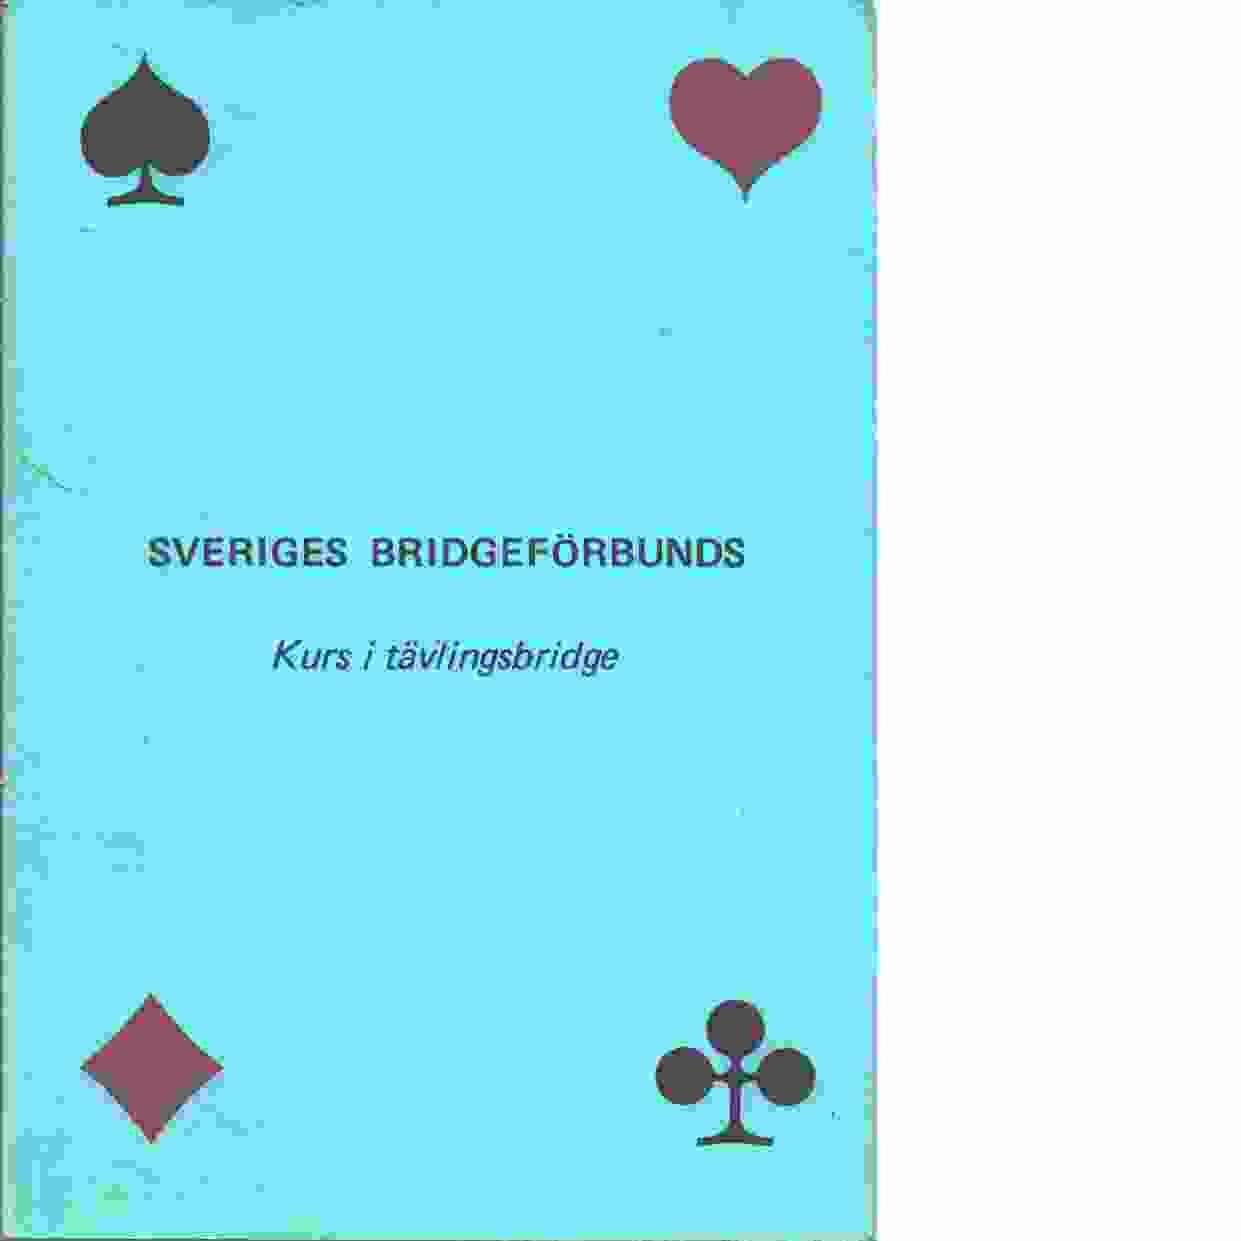 Grundkurs i tävlingsbridge - Westman, Ebbe och Ohlsson, Bengt